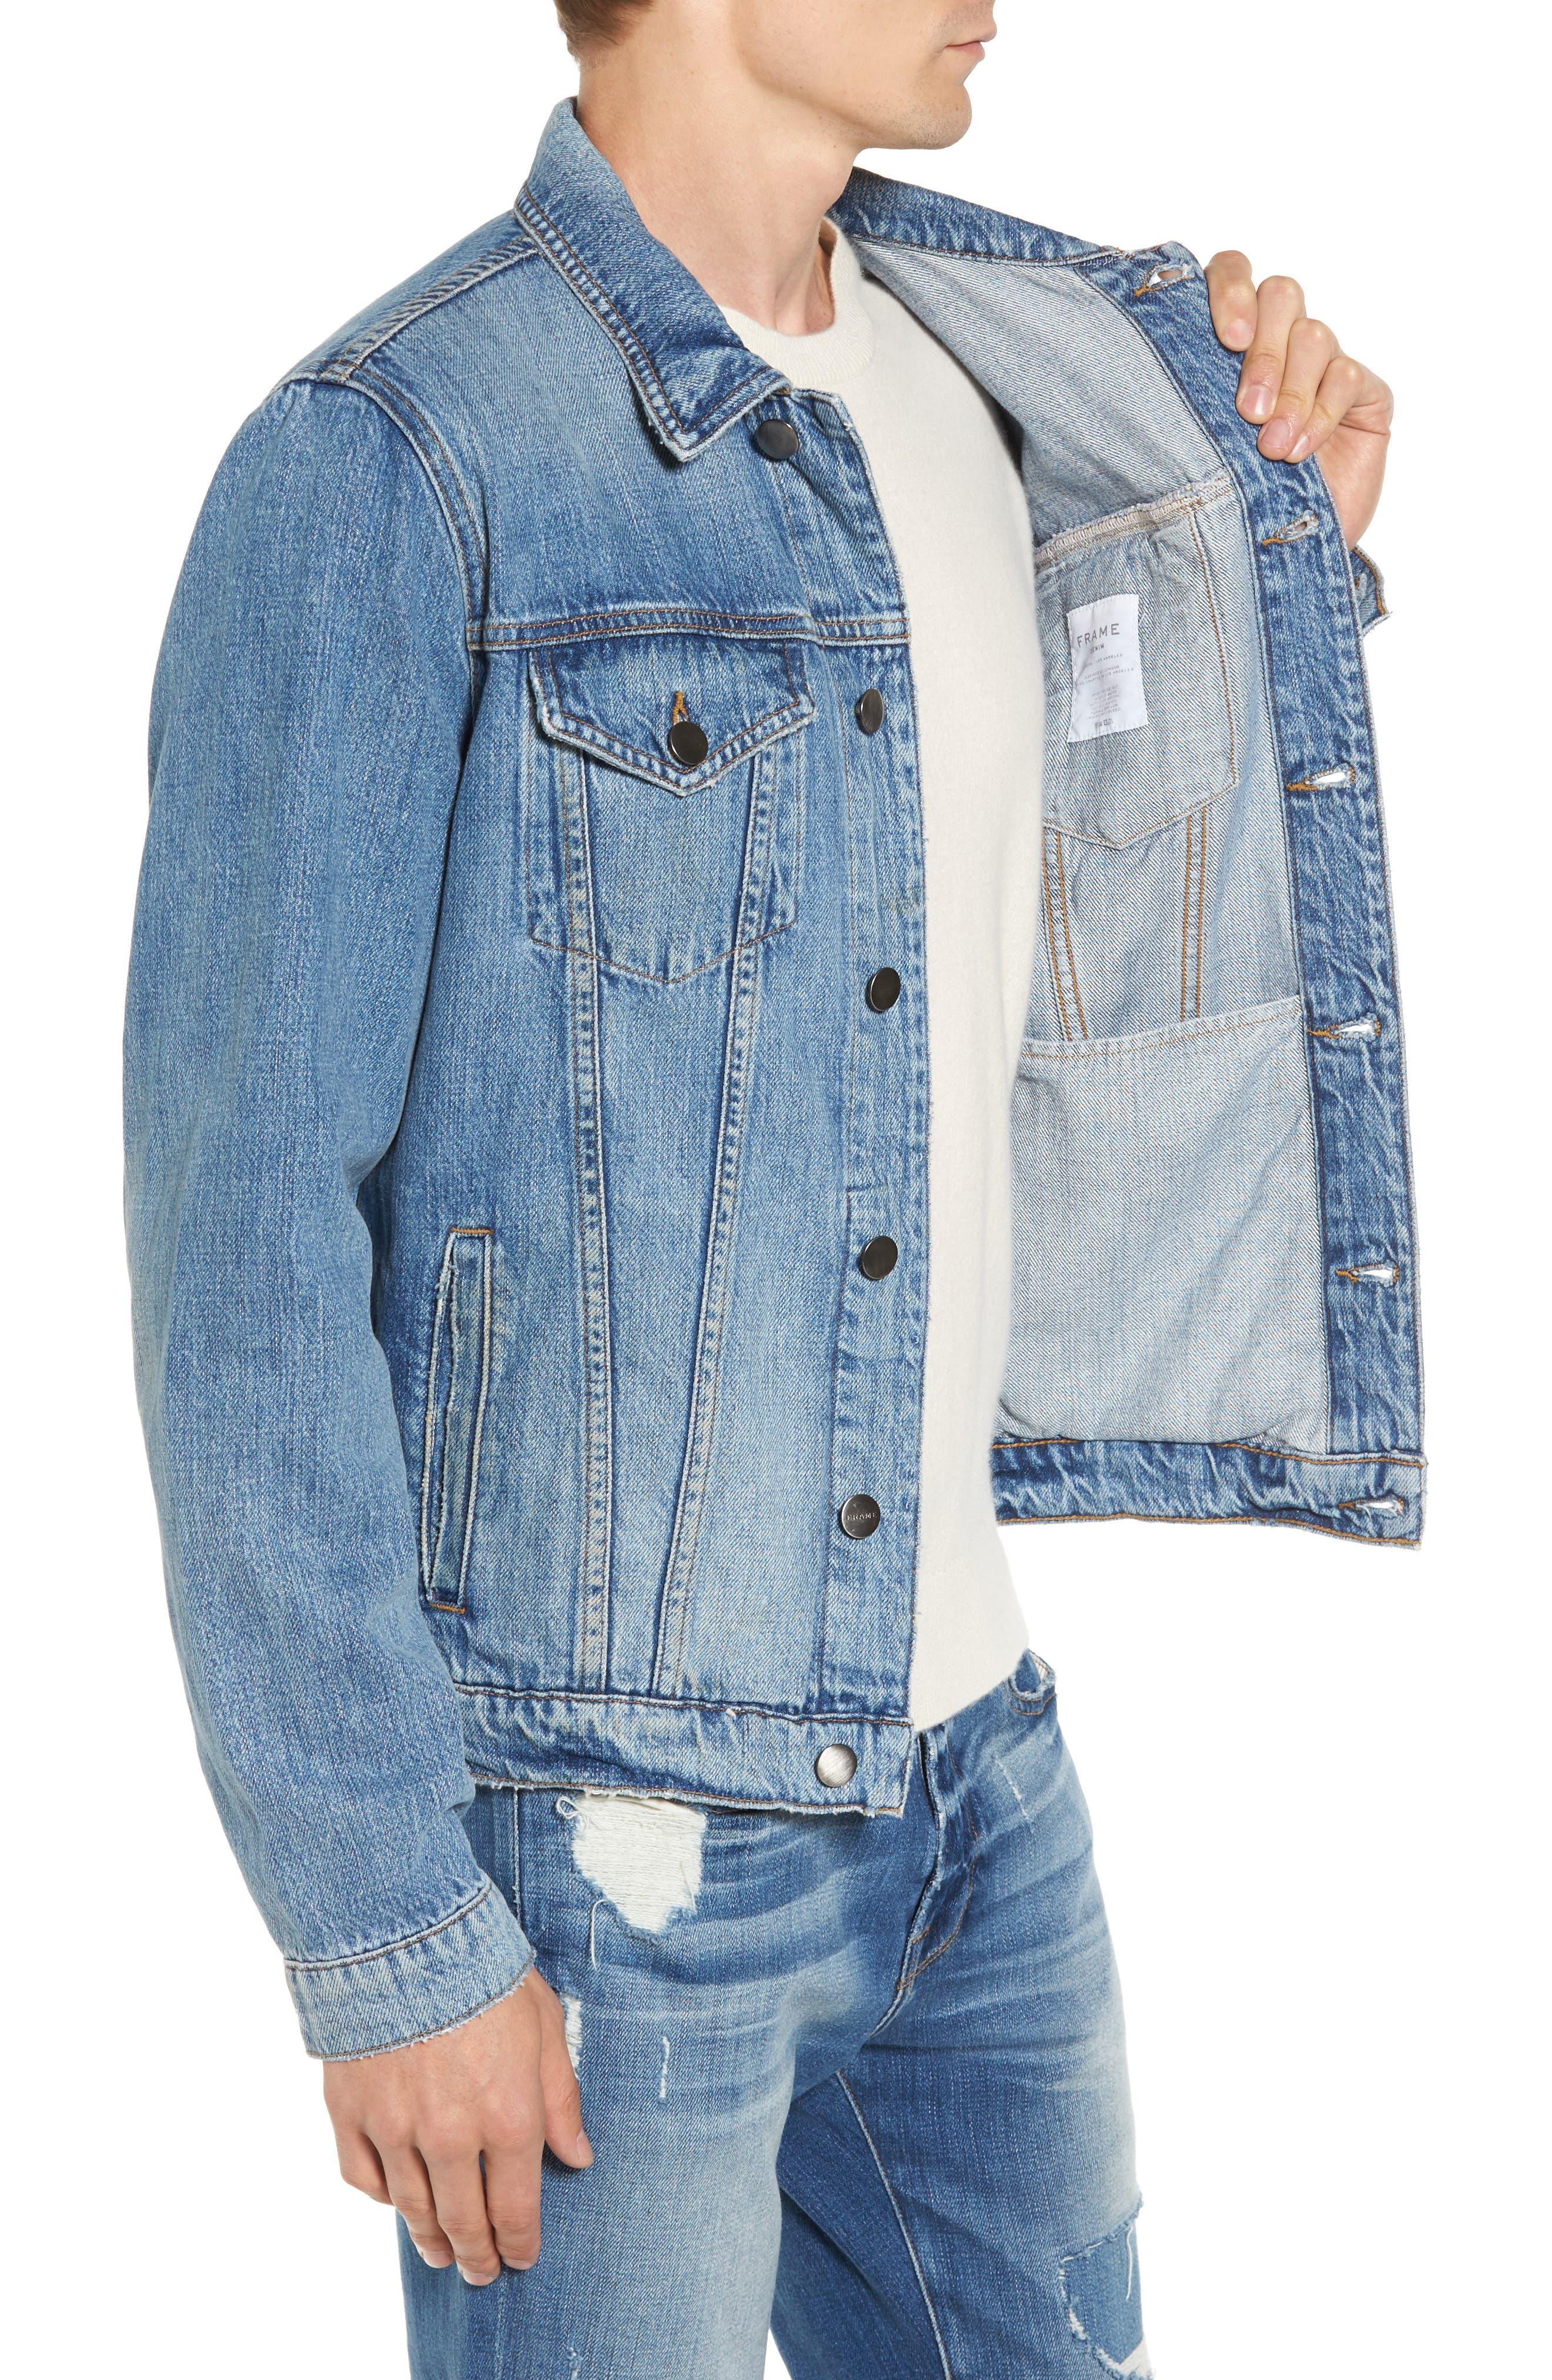 L'Homme Denim Jacket,                             Alternate thumbnail 3, color,                             450